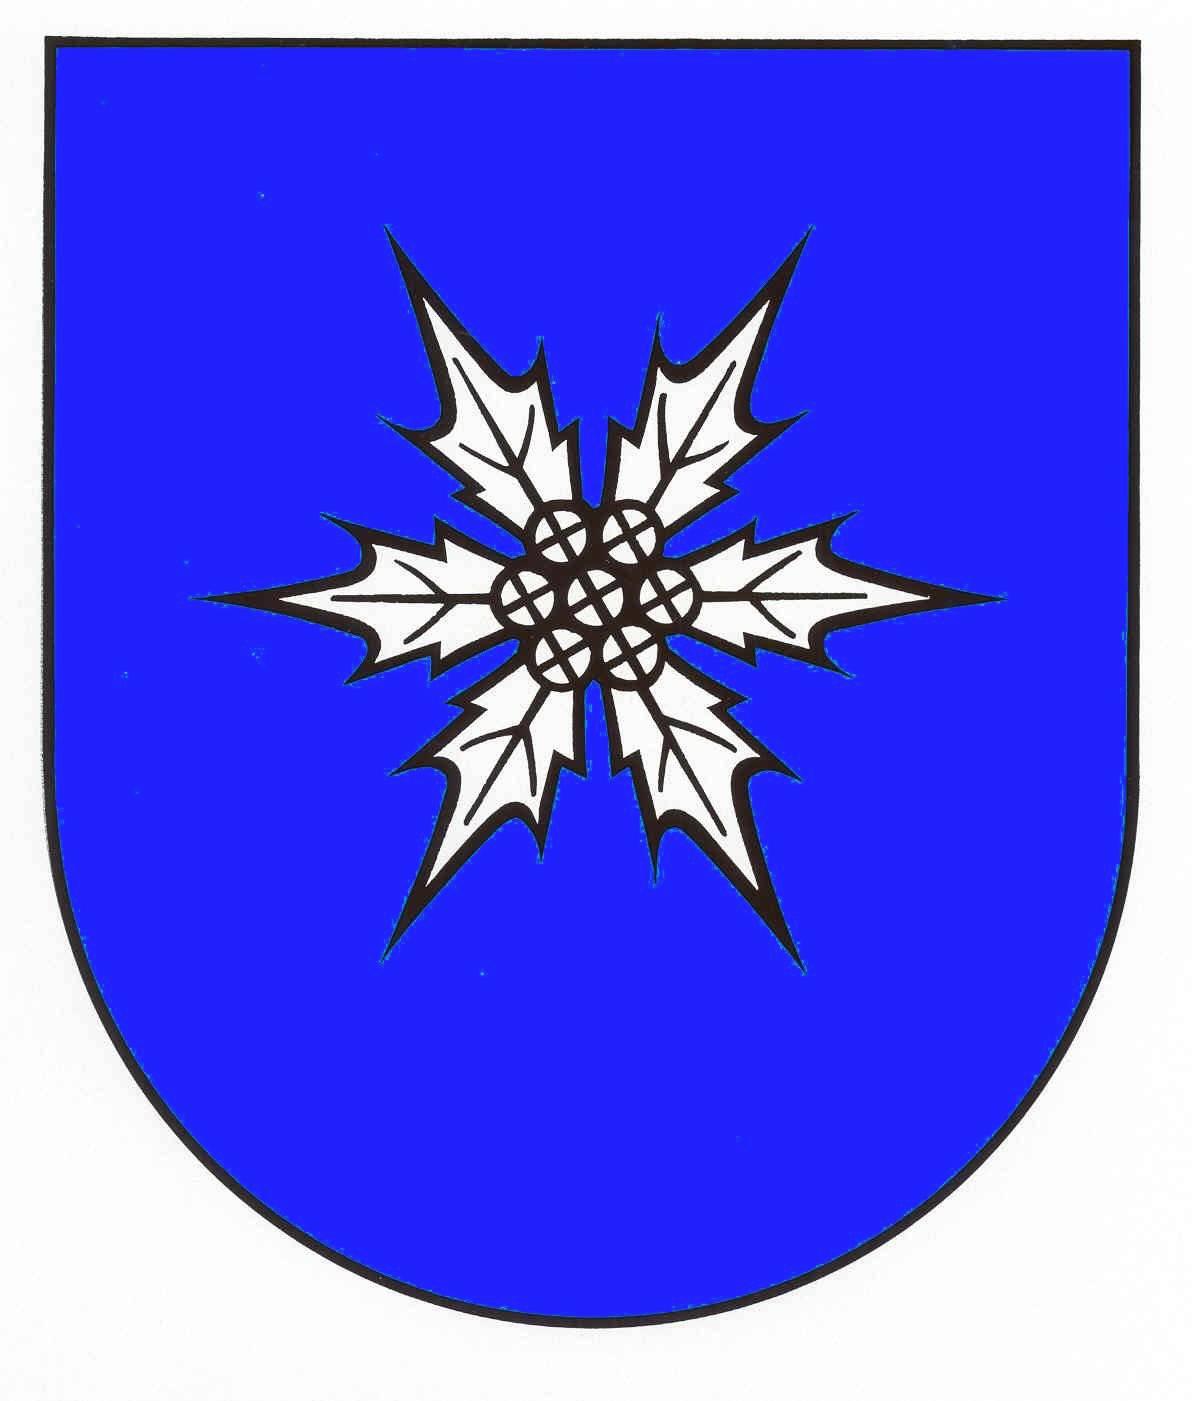 Wappen GemeindeKampen, Kreis Nordfriesland